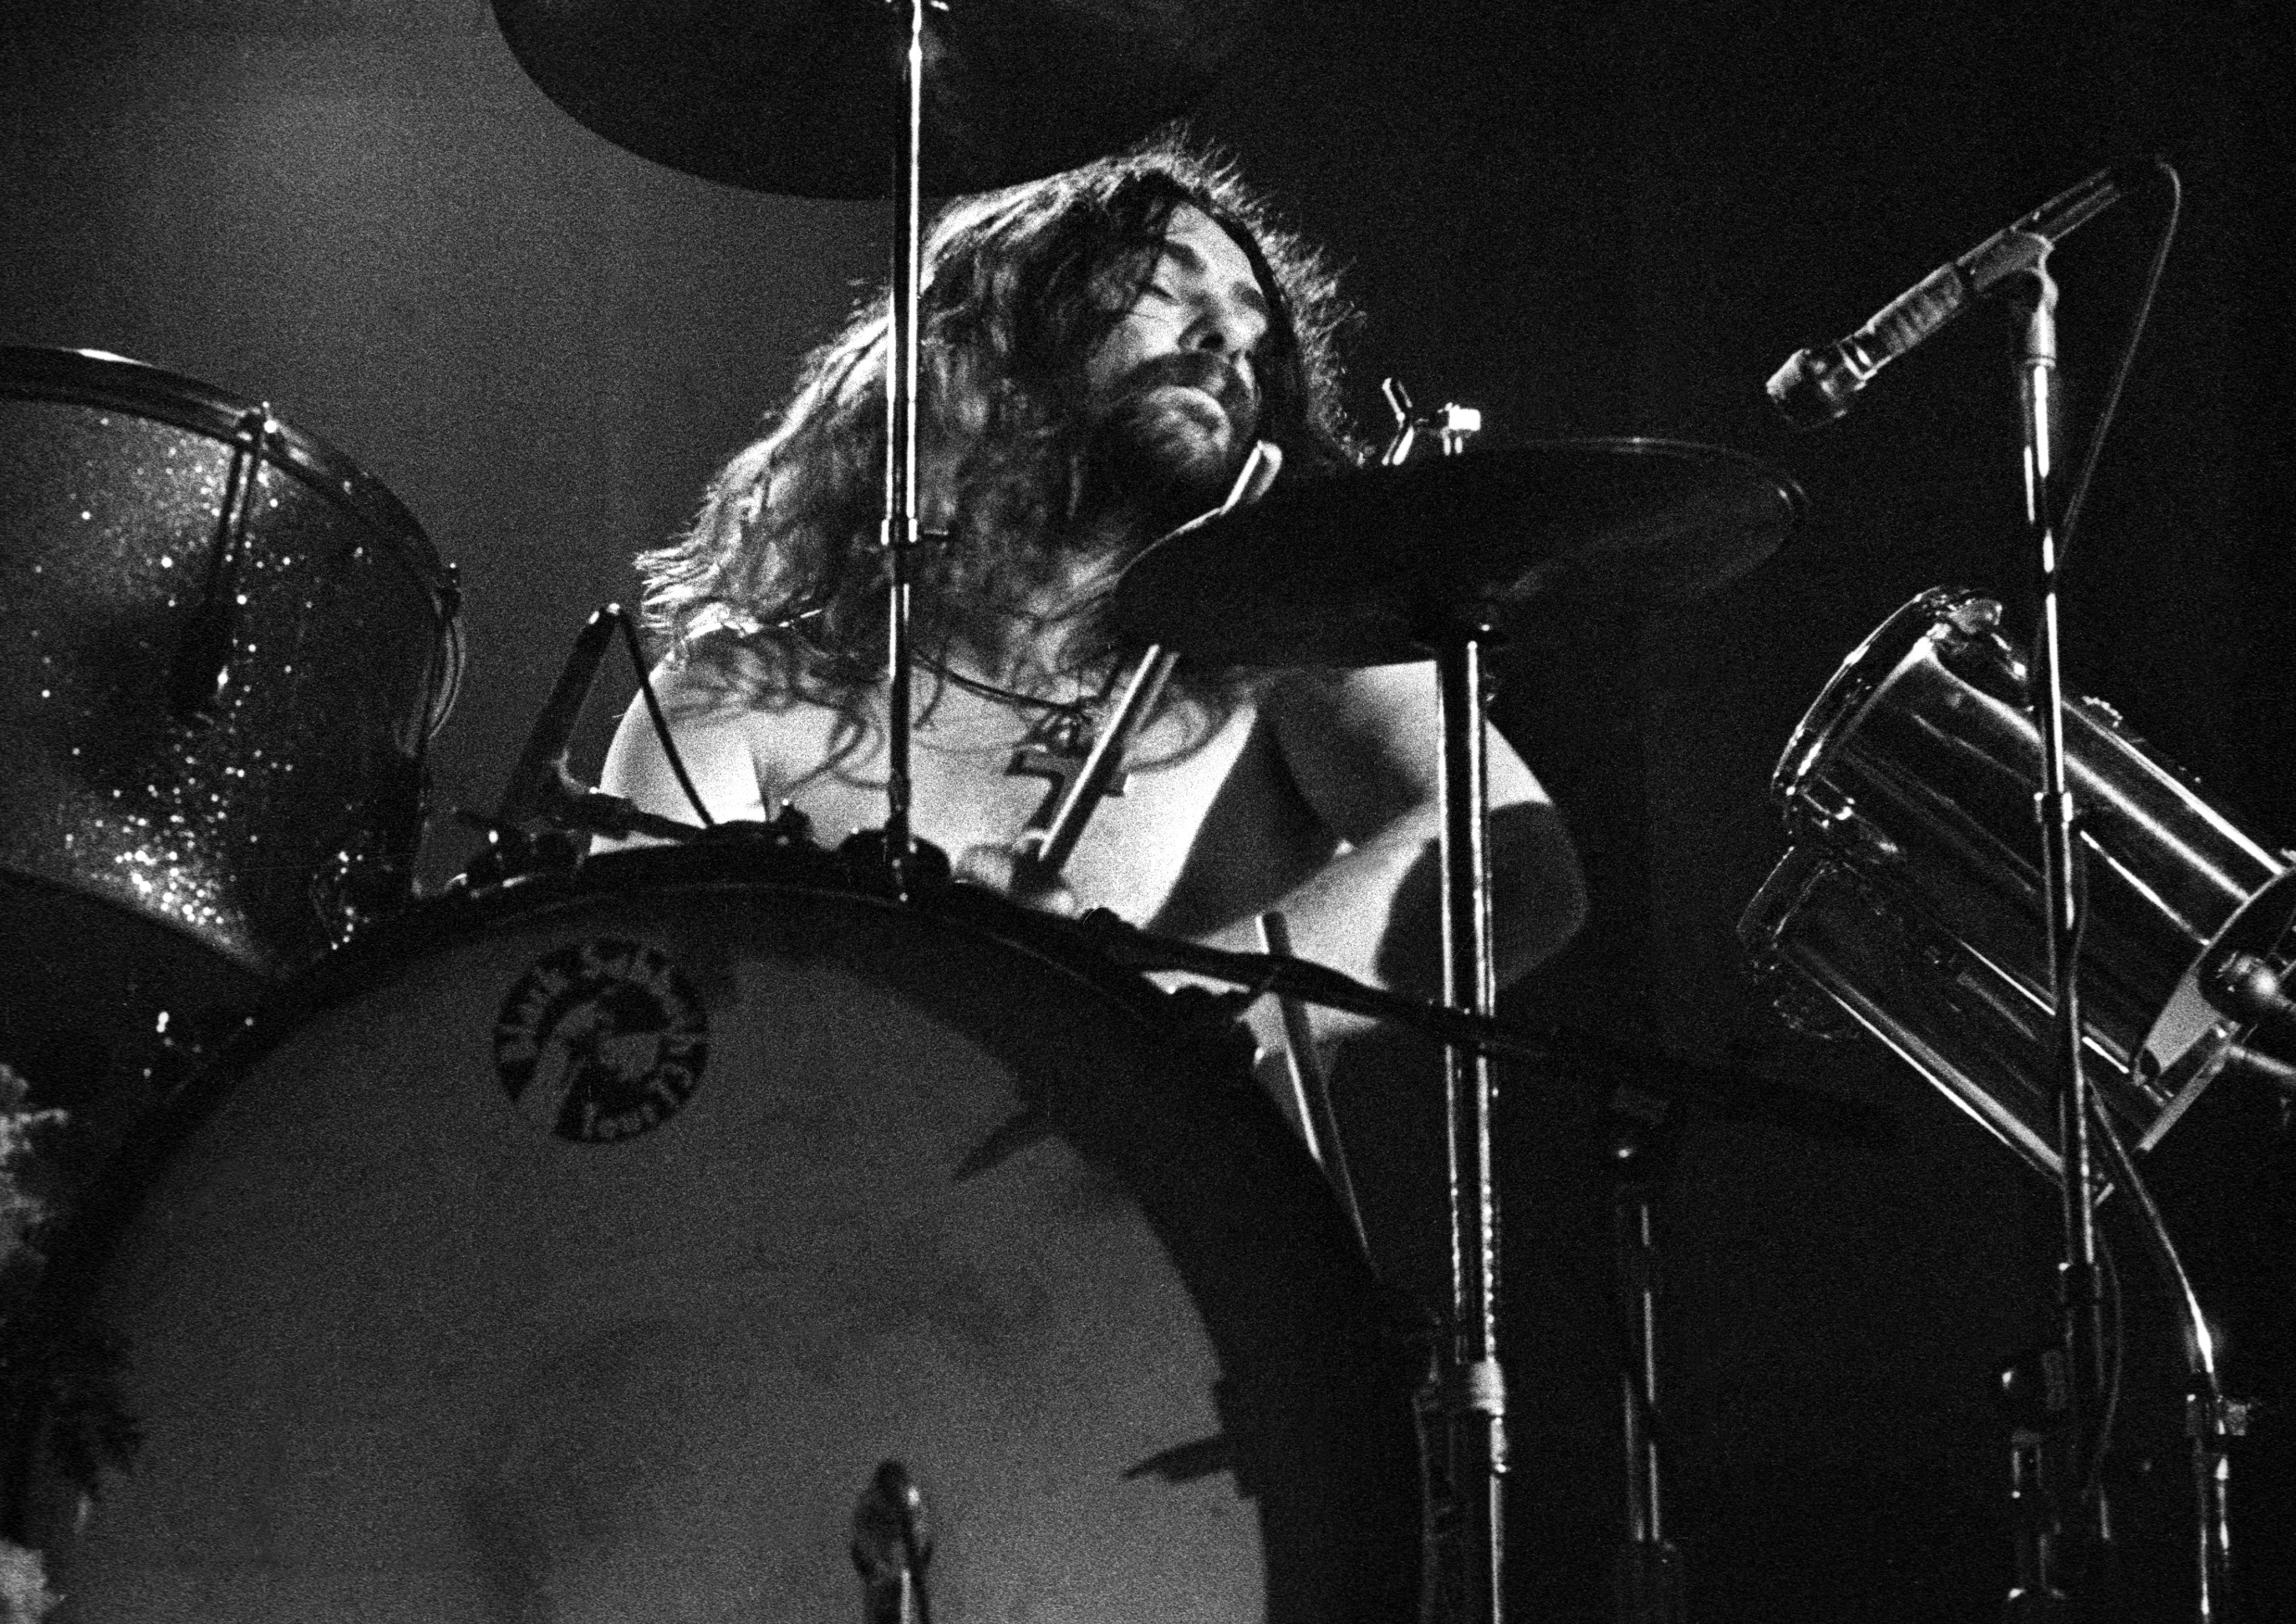 Black Sabbath's Bill Ward: My 10 Favorite Metal Albums – Rolling Stone